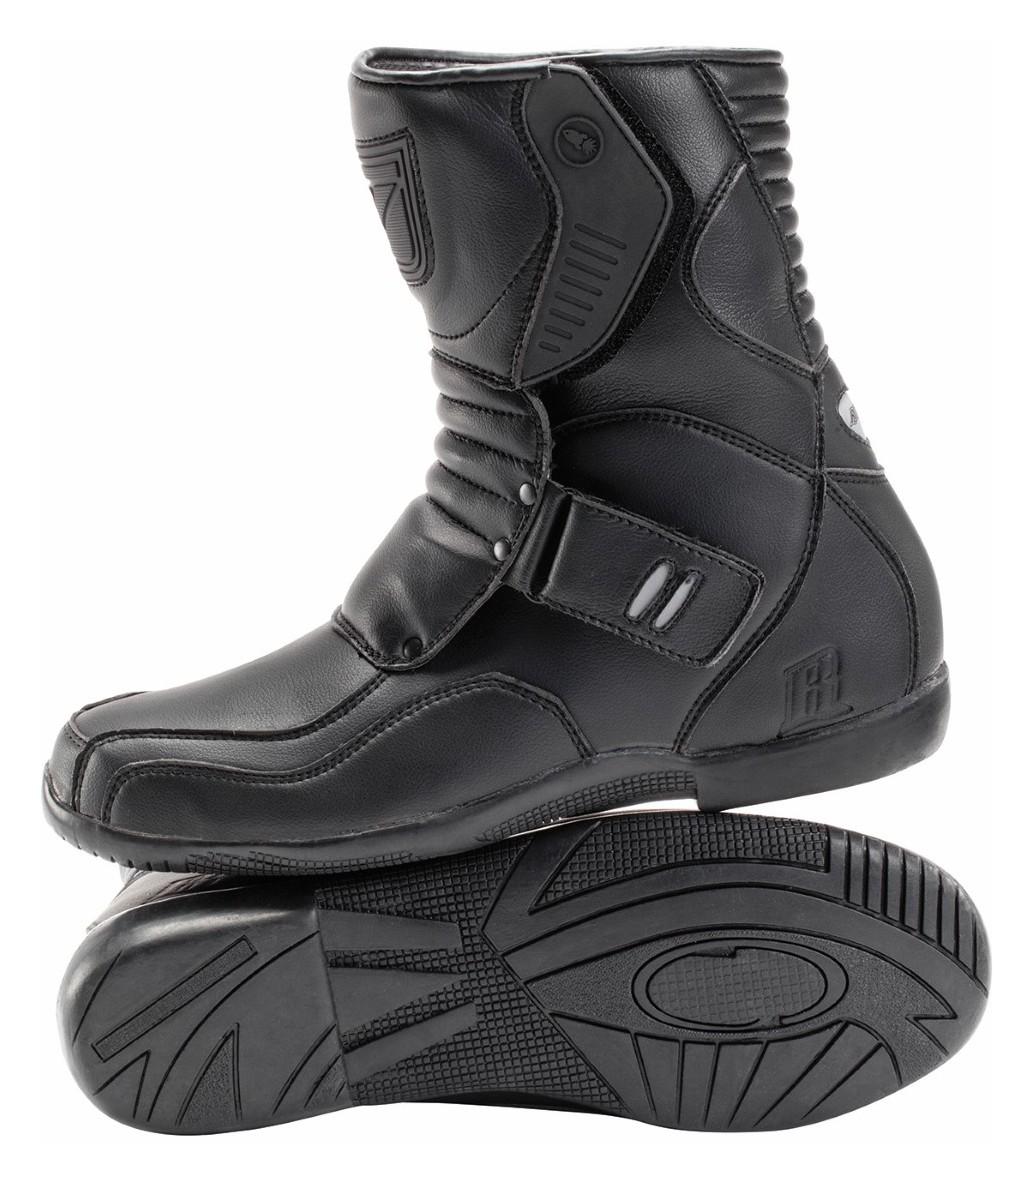 Joe Rocket Mens Snowmobile Boot Black US 12 1825-012